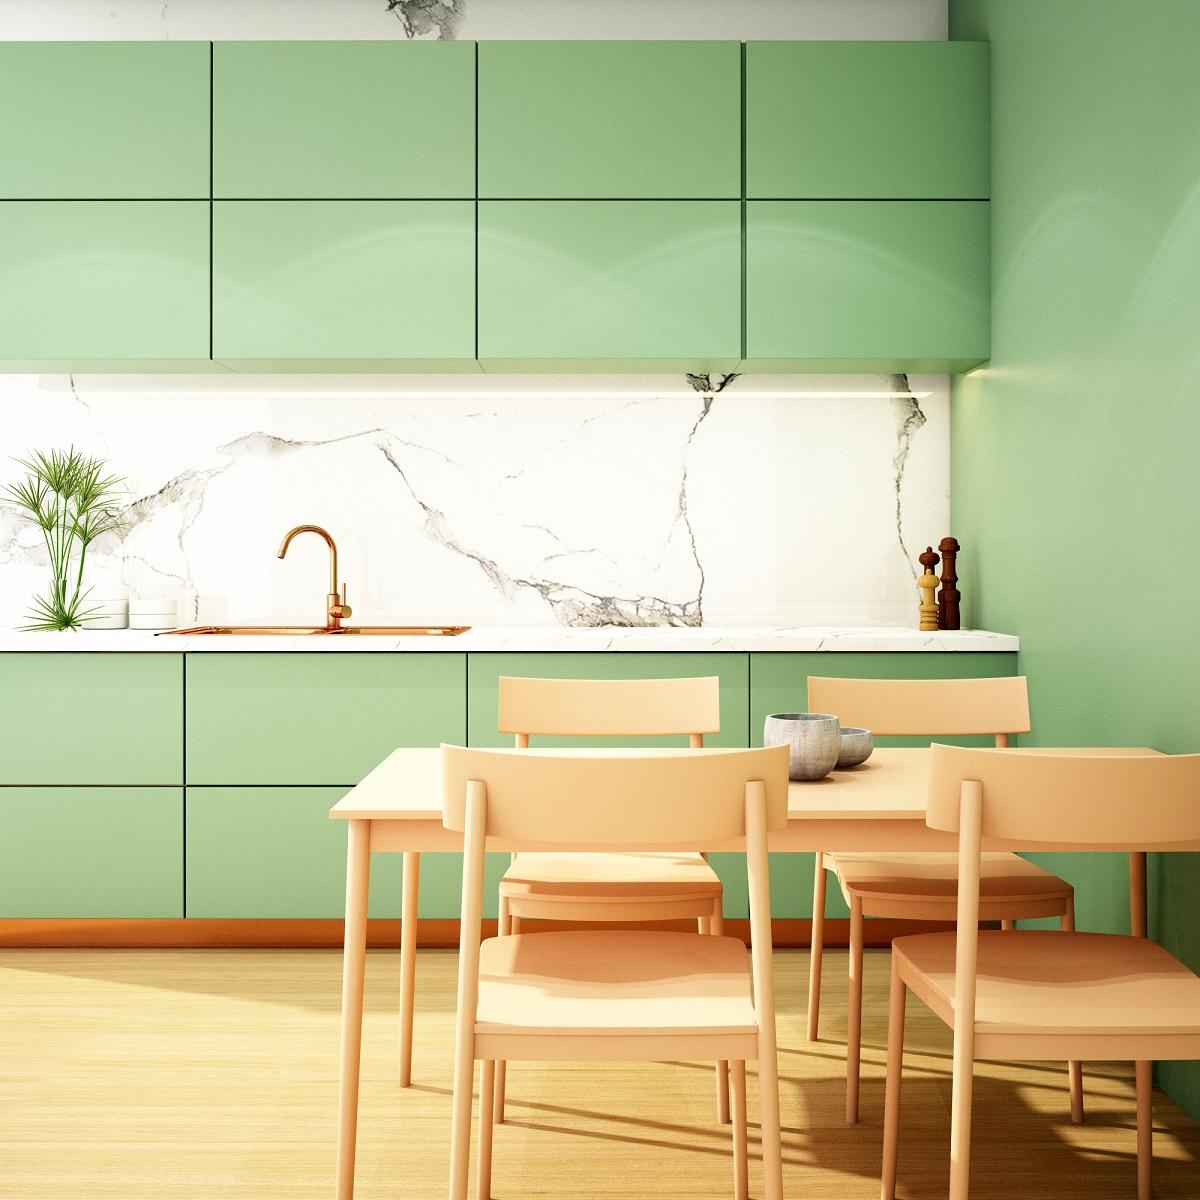 Full Size of Kitchen Interior Design In Modern Style,3d Rendering,3d Illustration Küche Küche Mintgrün